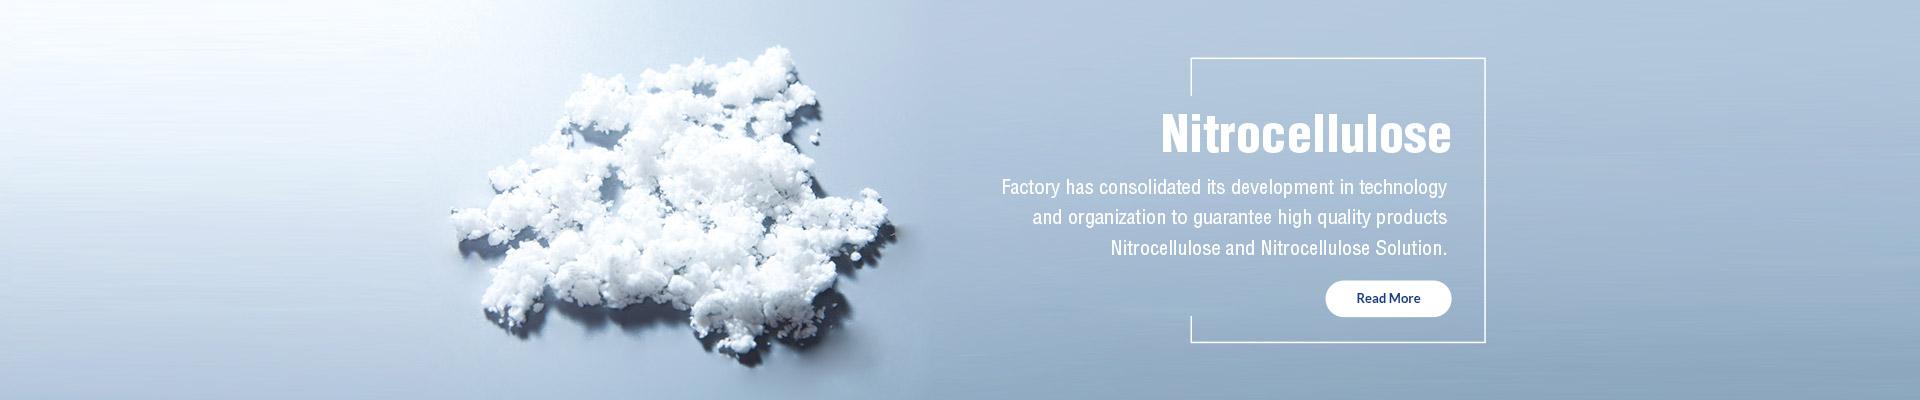 Nitrocellulose